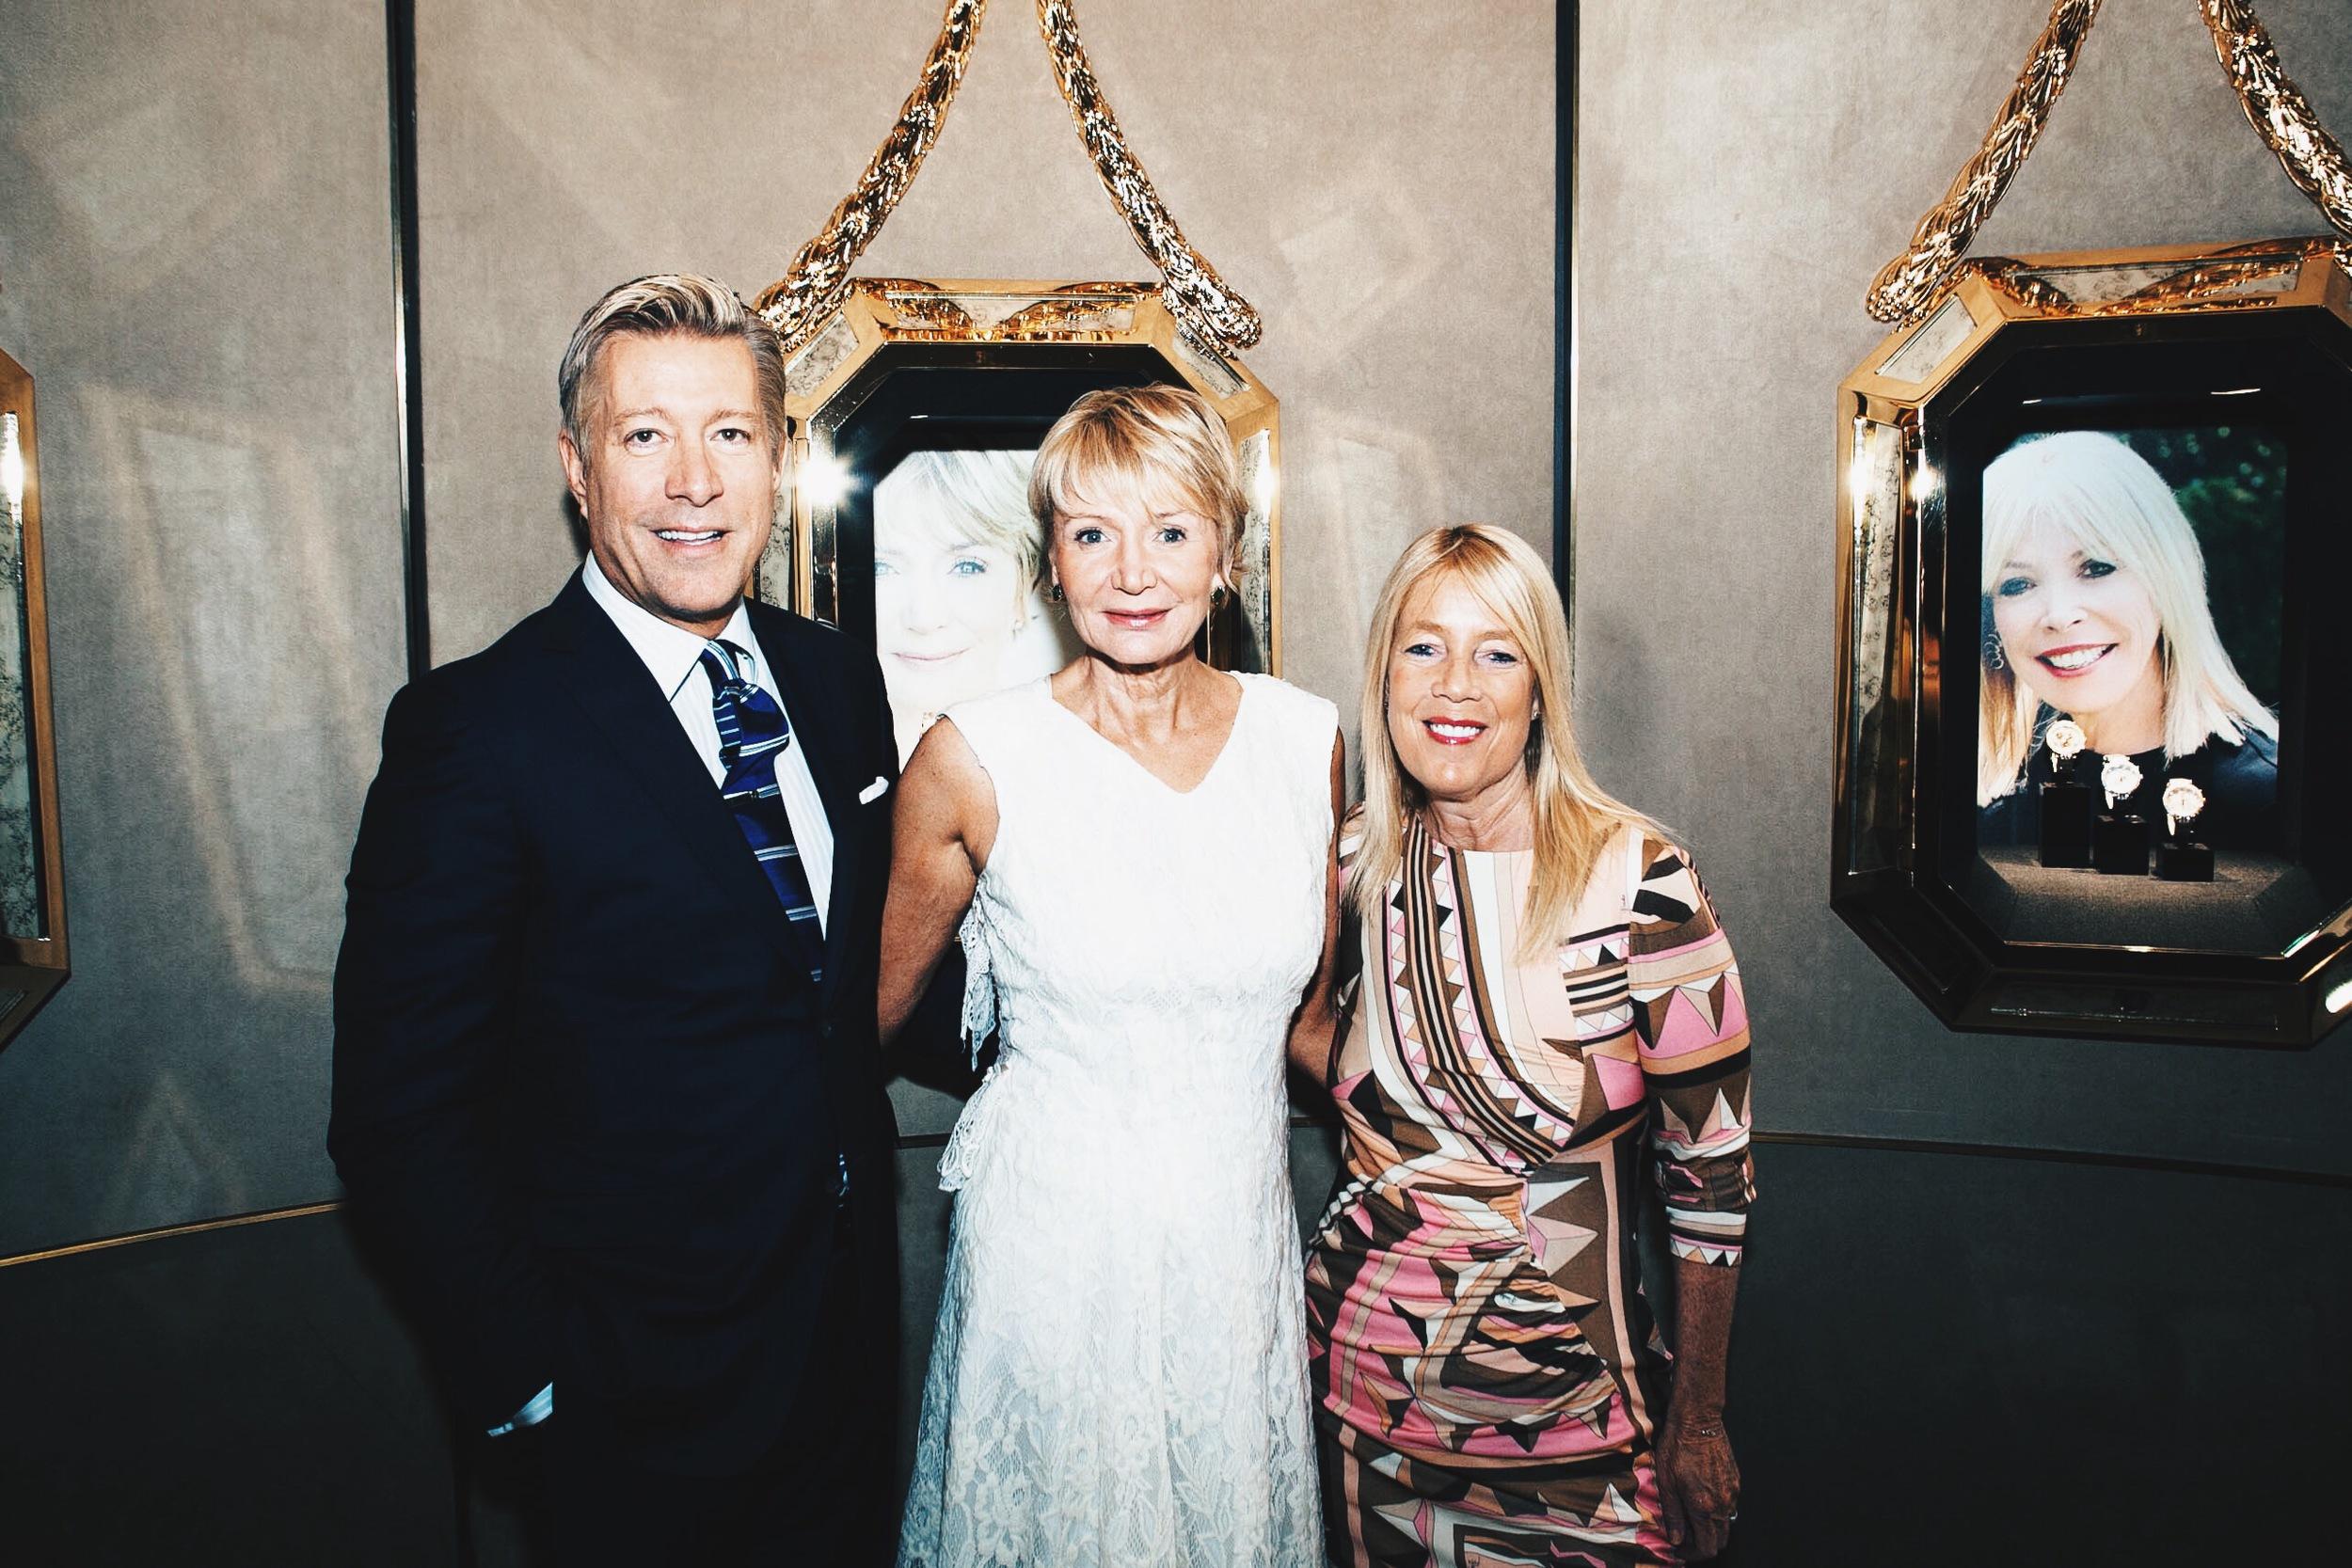 Kirk Nix, Shelley Reid (altruist), Lilly Bosse (Mayer of Beverly Hills)